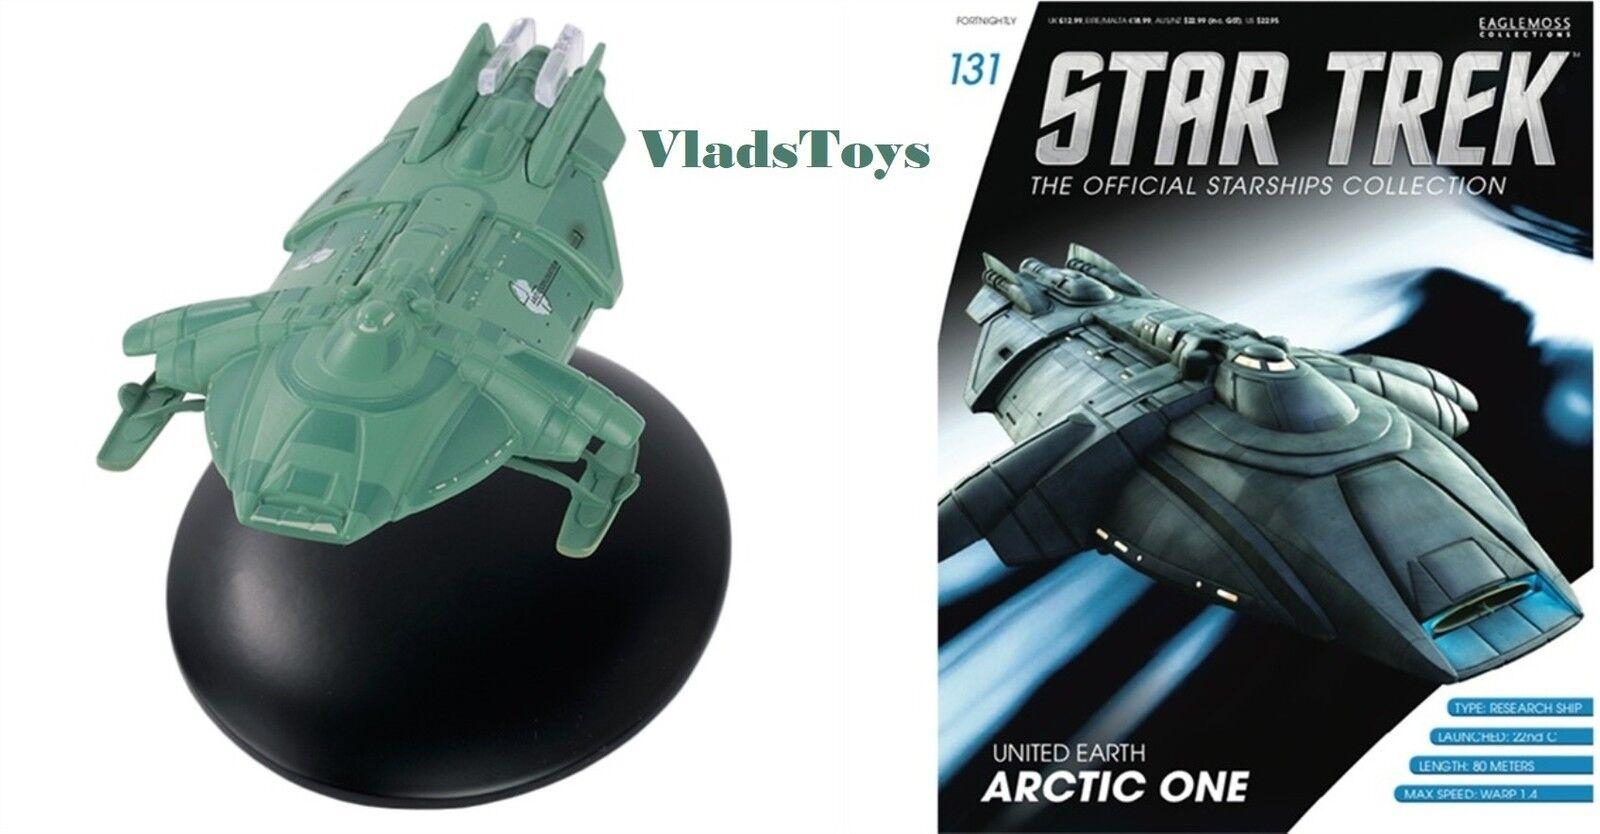 United Earth Arctic One Eaglemoss Star Trek Issue w Magazine